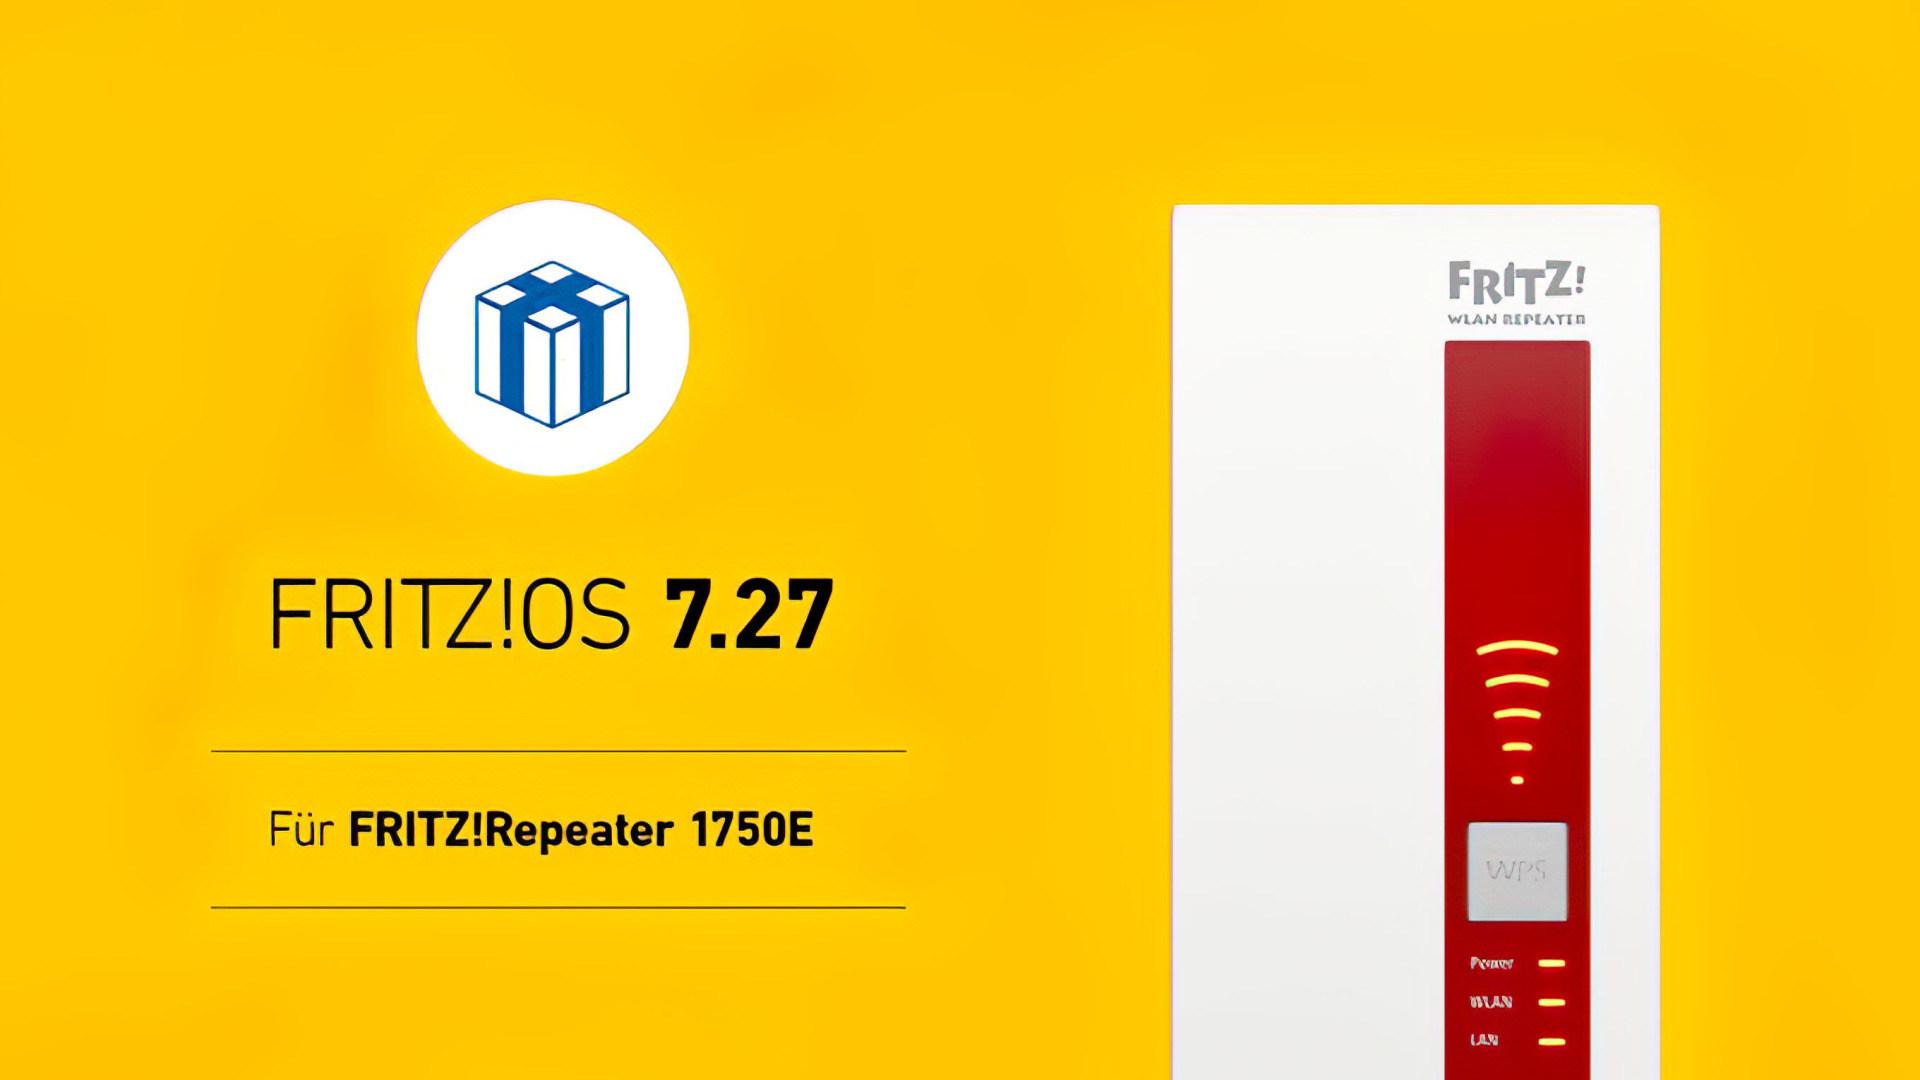 Fritzbox, FritzOS, FritzRepeater, FRITZ!Repeater 1750E